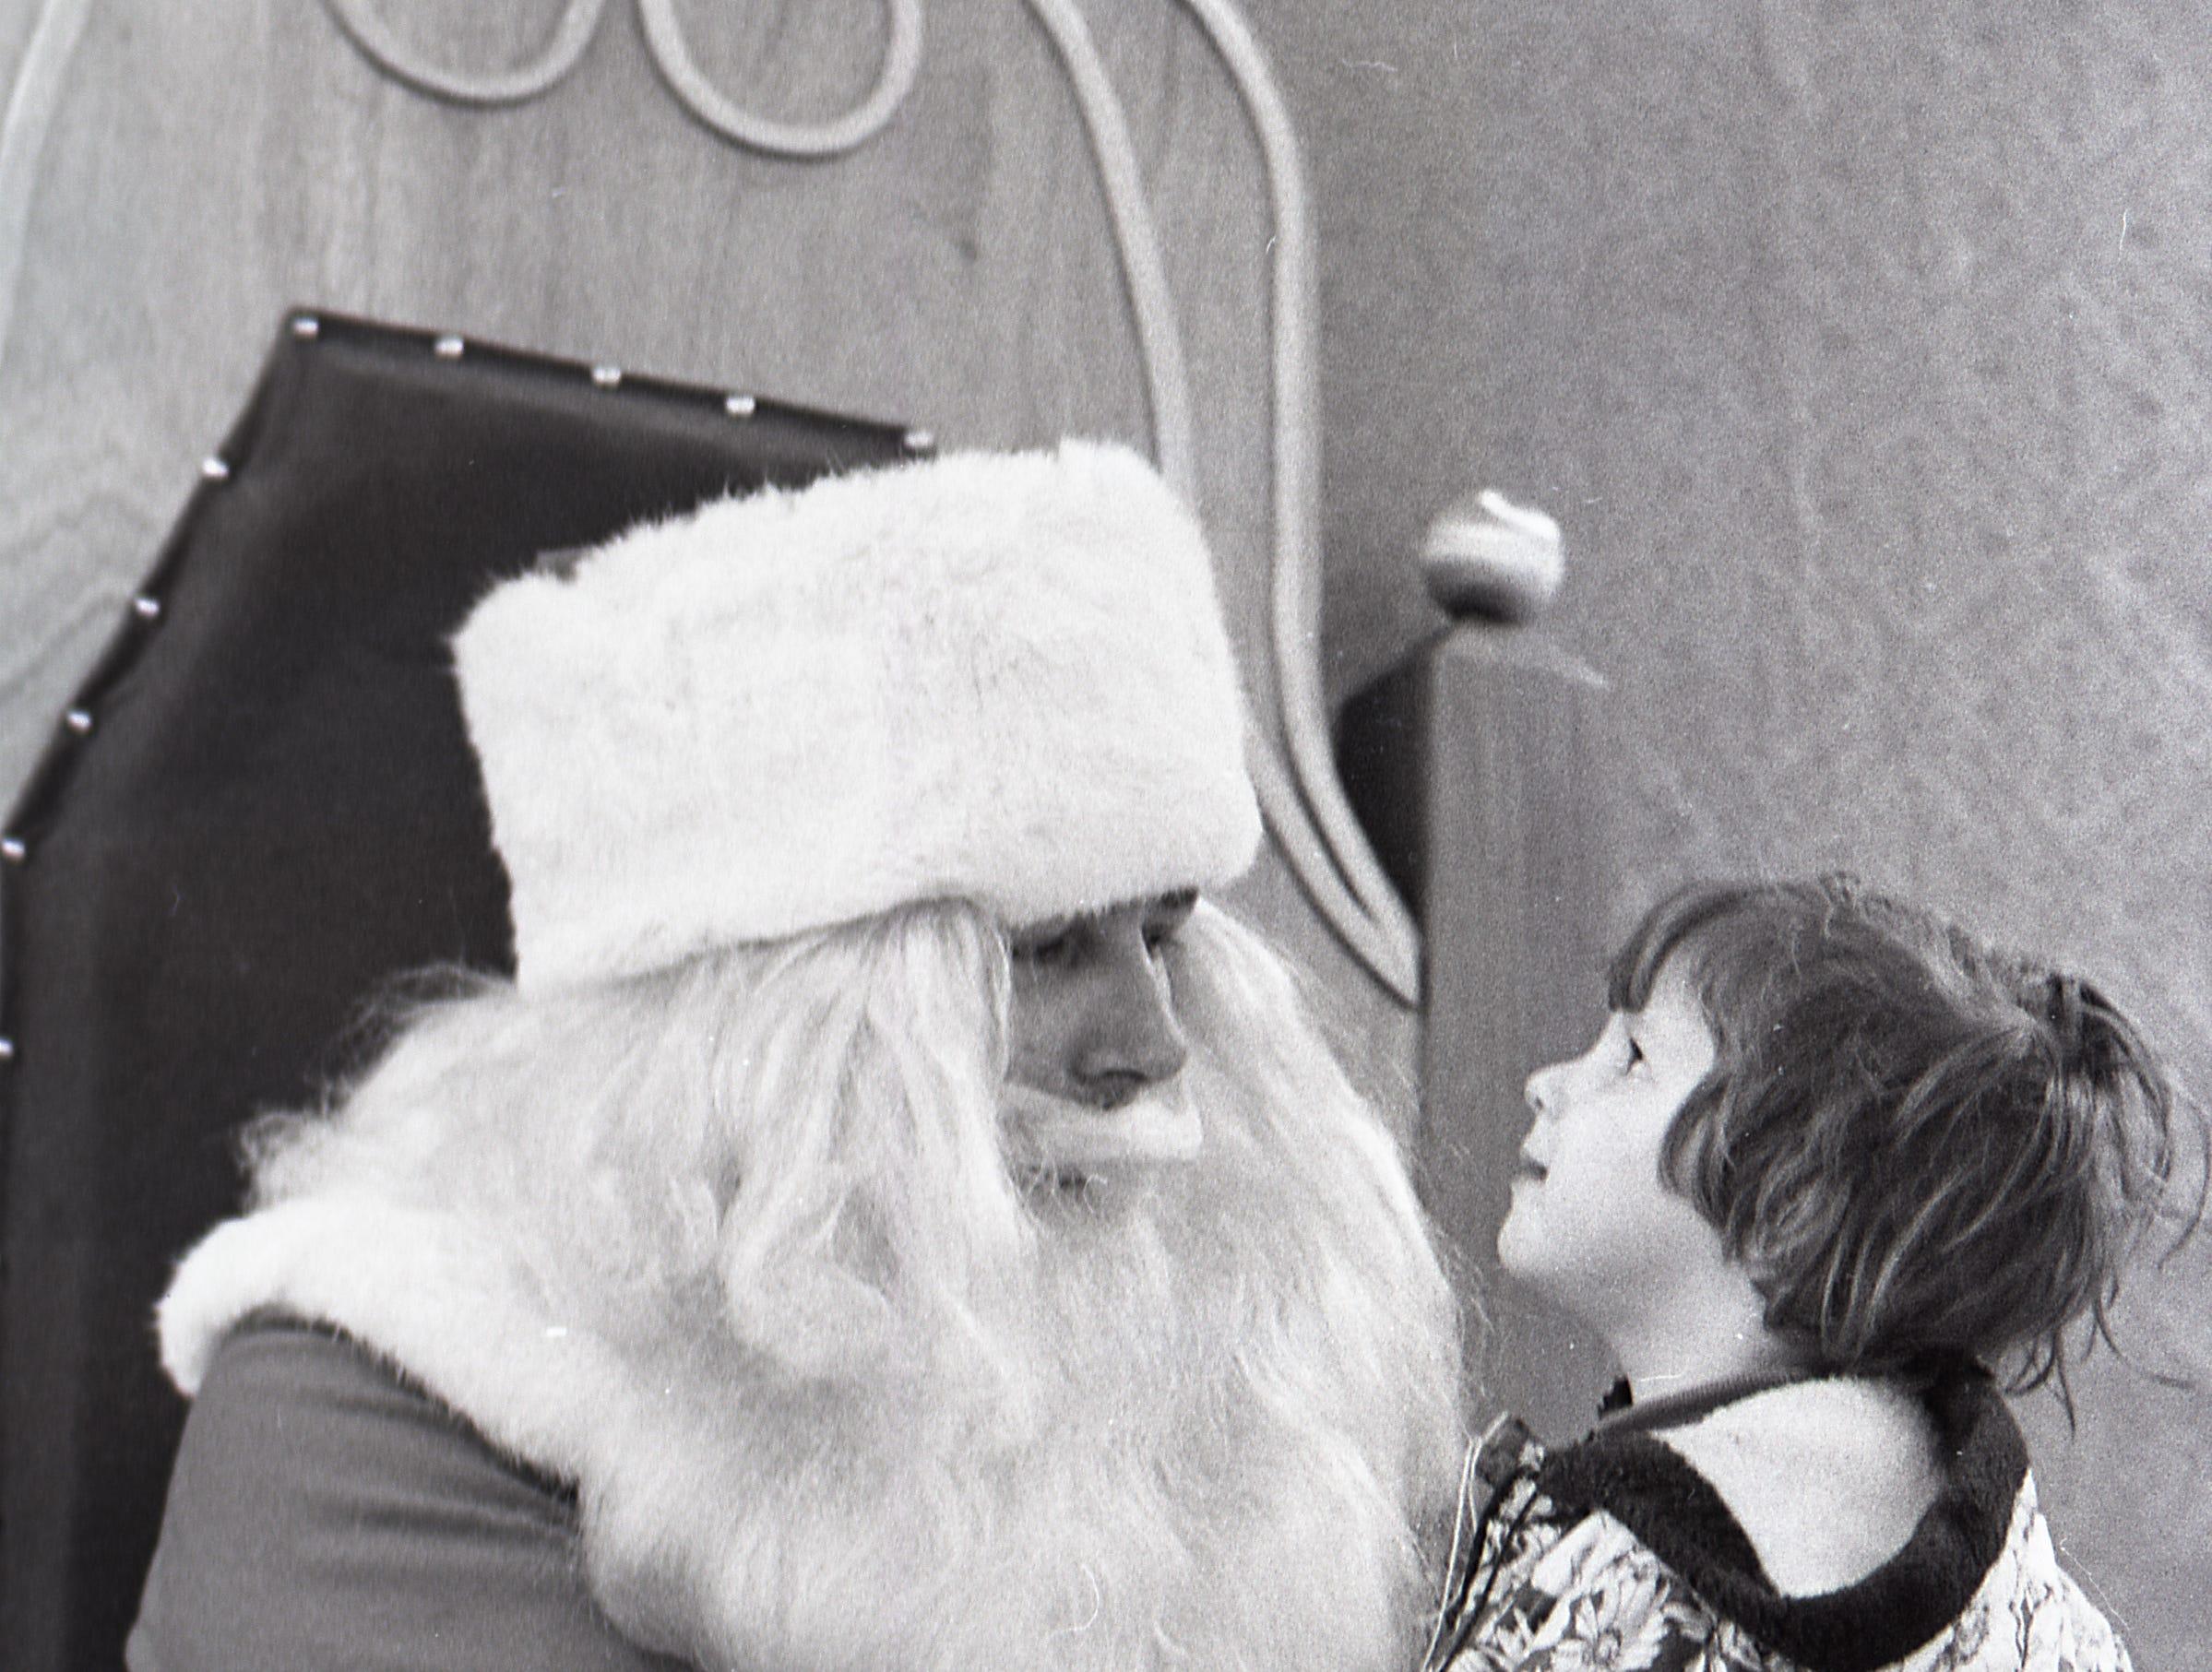 A child pays a visit to Santa, Nov. 30, 1971.